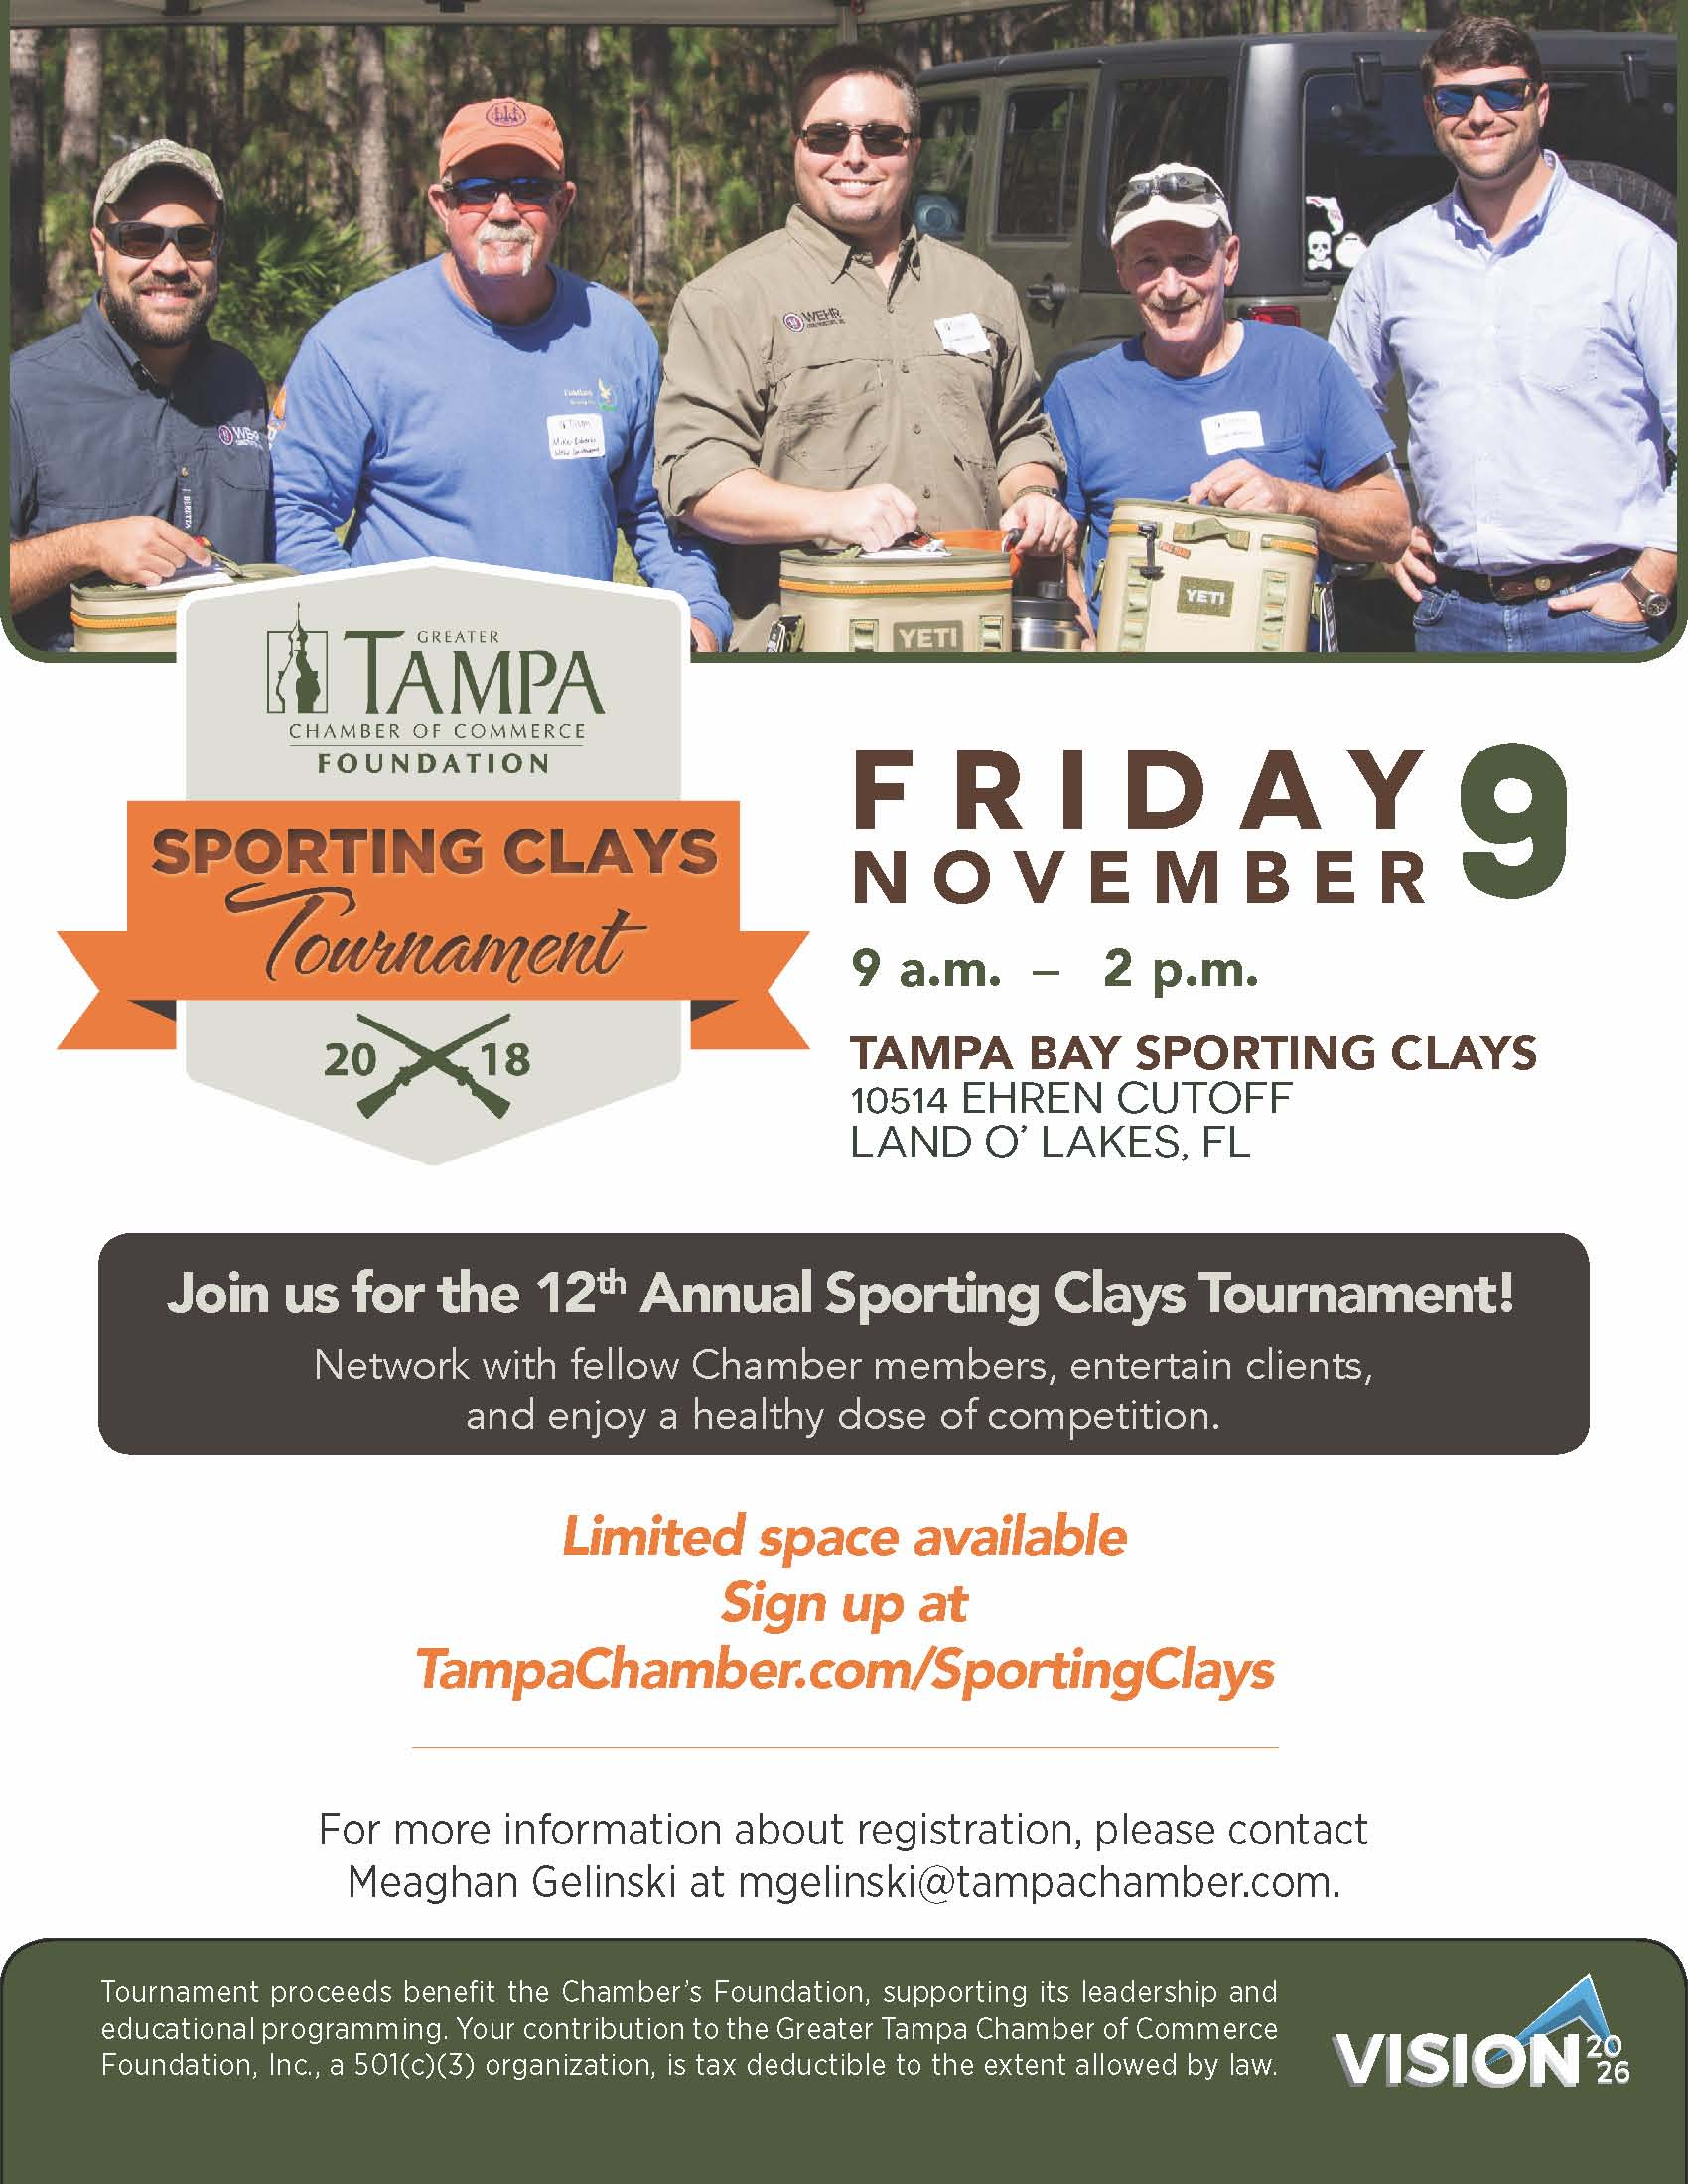 Sporting Clays 2018 Flyer.jpg